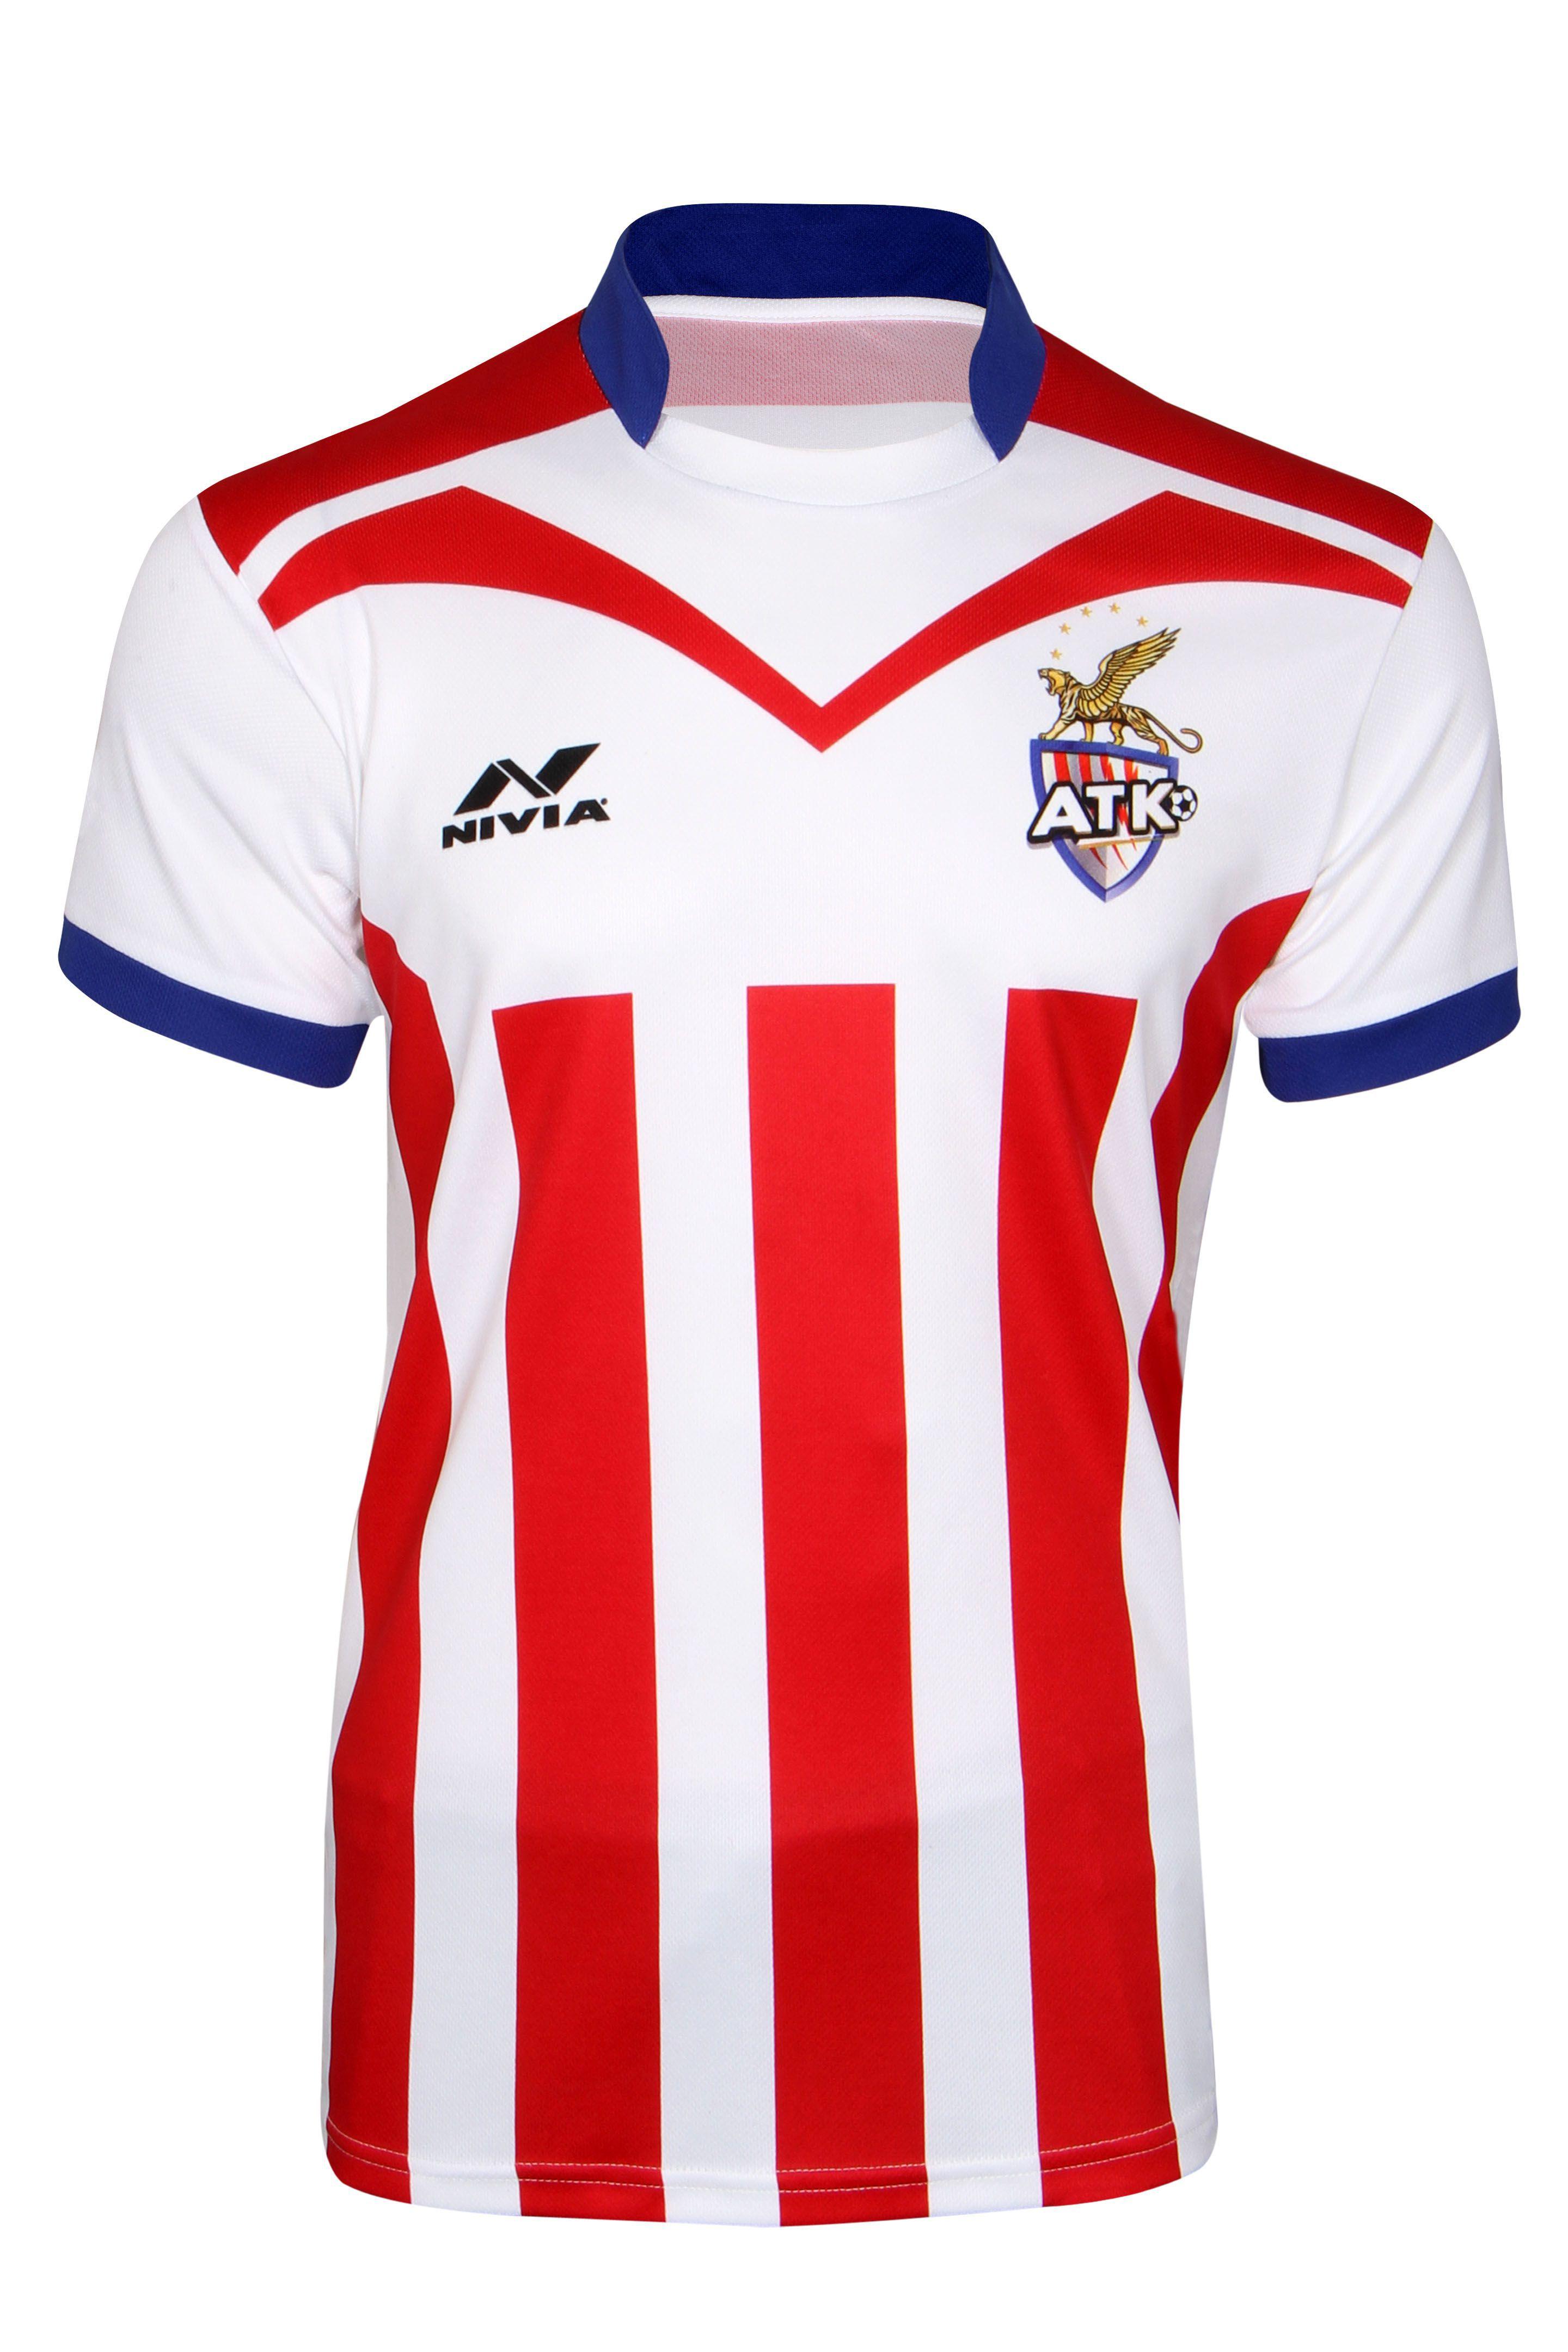 Nivia Atletico De Kolkata Team Jersey-N-PK-PP-J-M